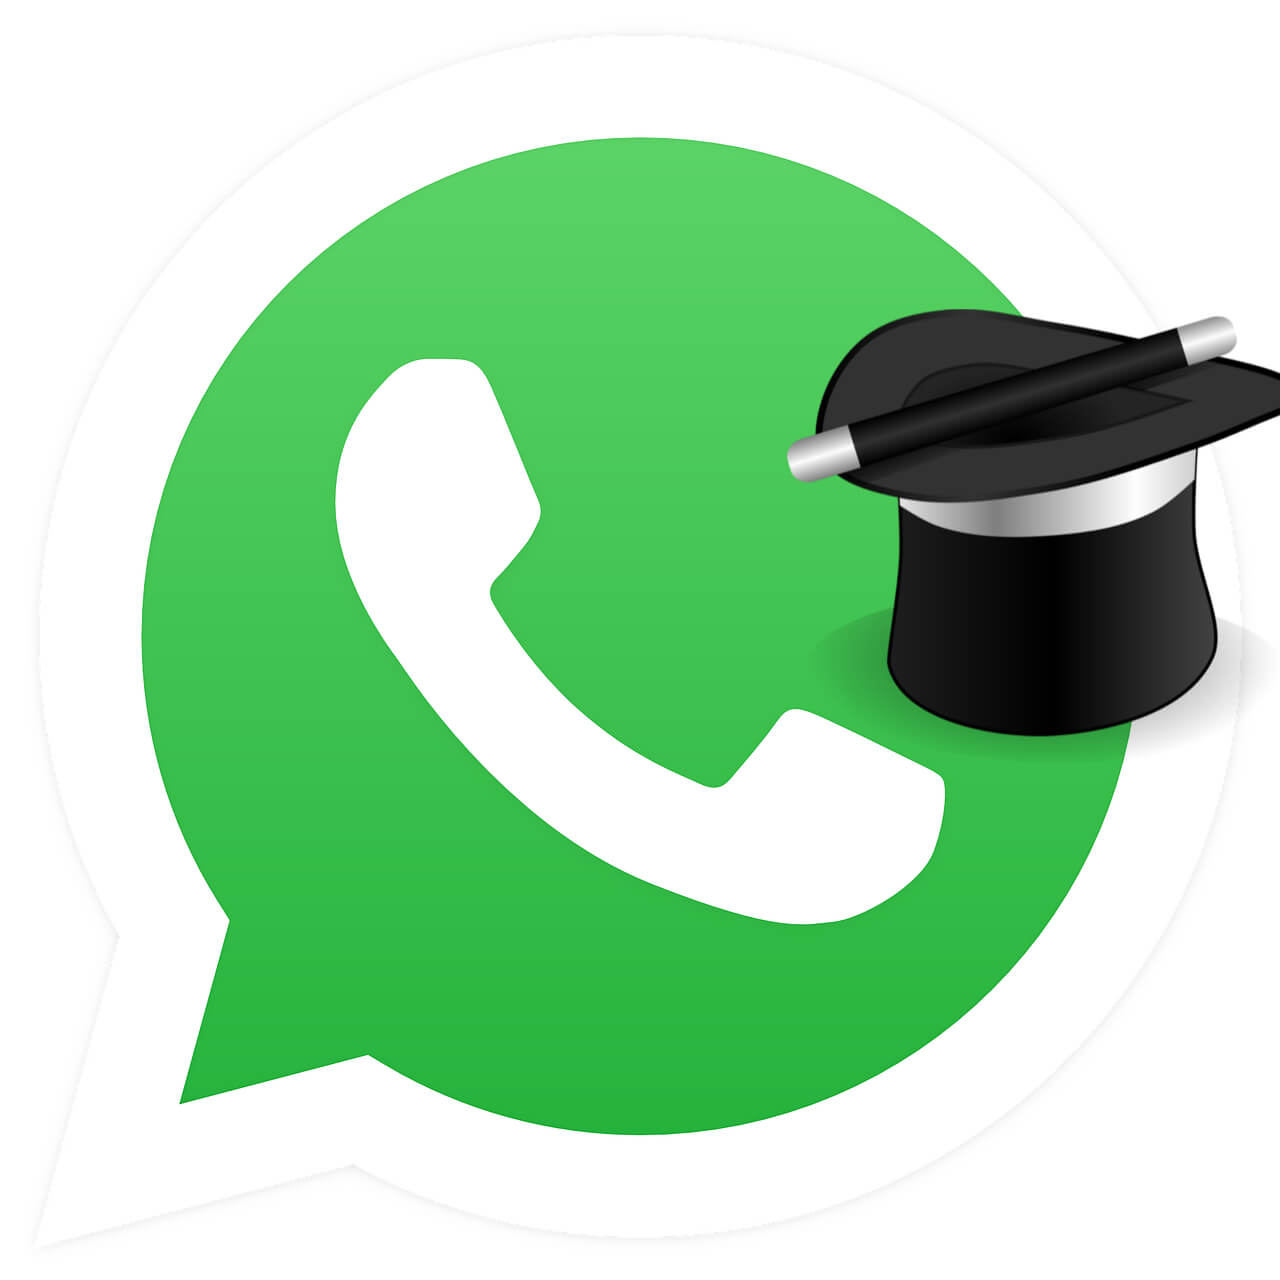 Trucchi Nascosti Whatsapp Gfcomputers Snc